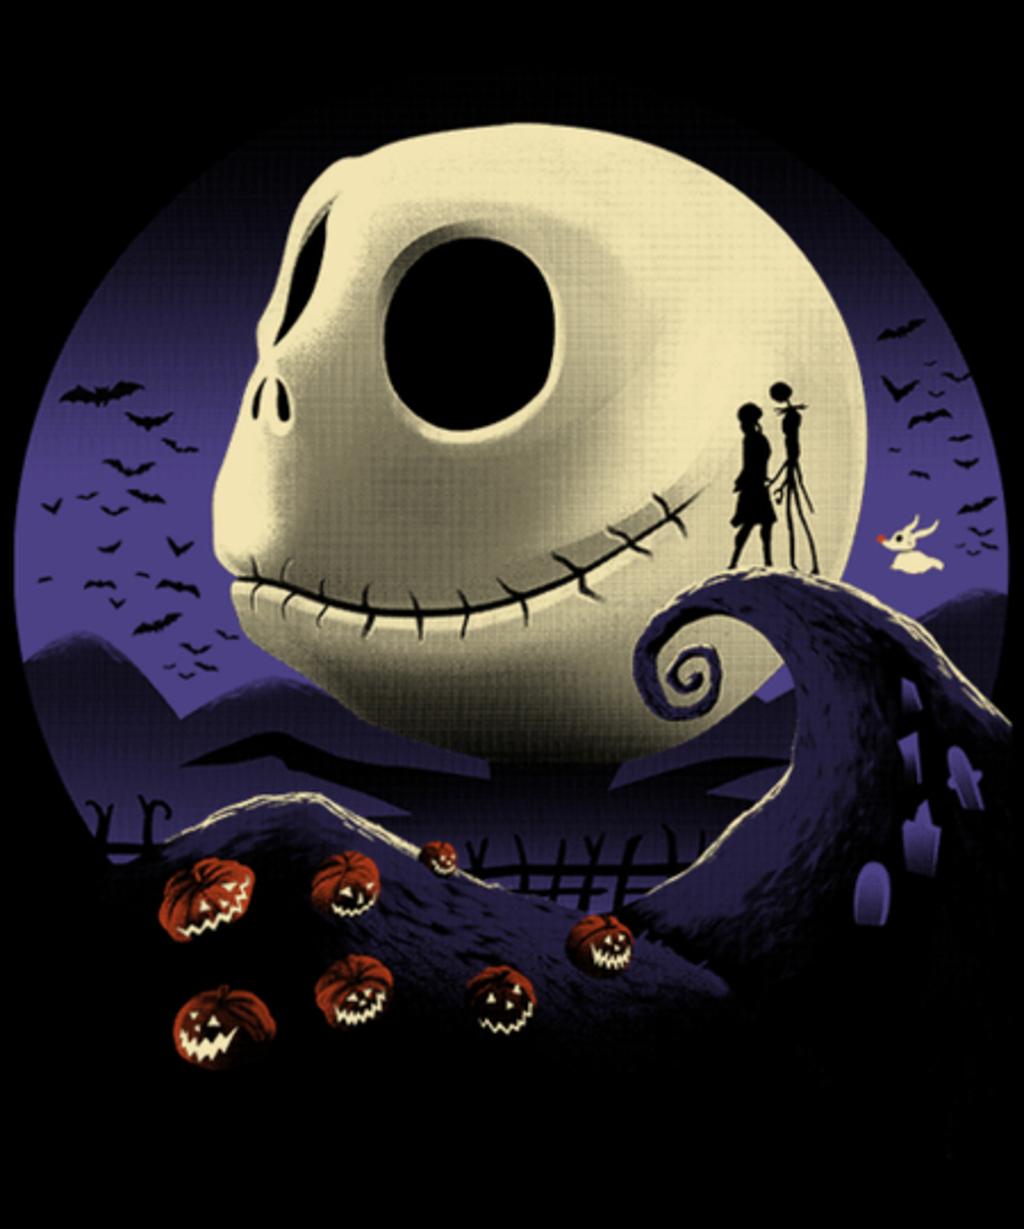 Qwertee: Pumpkins and Nightmares